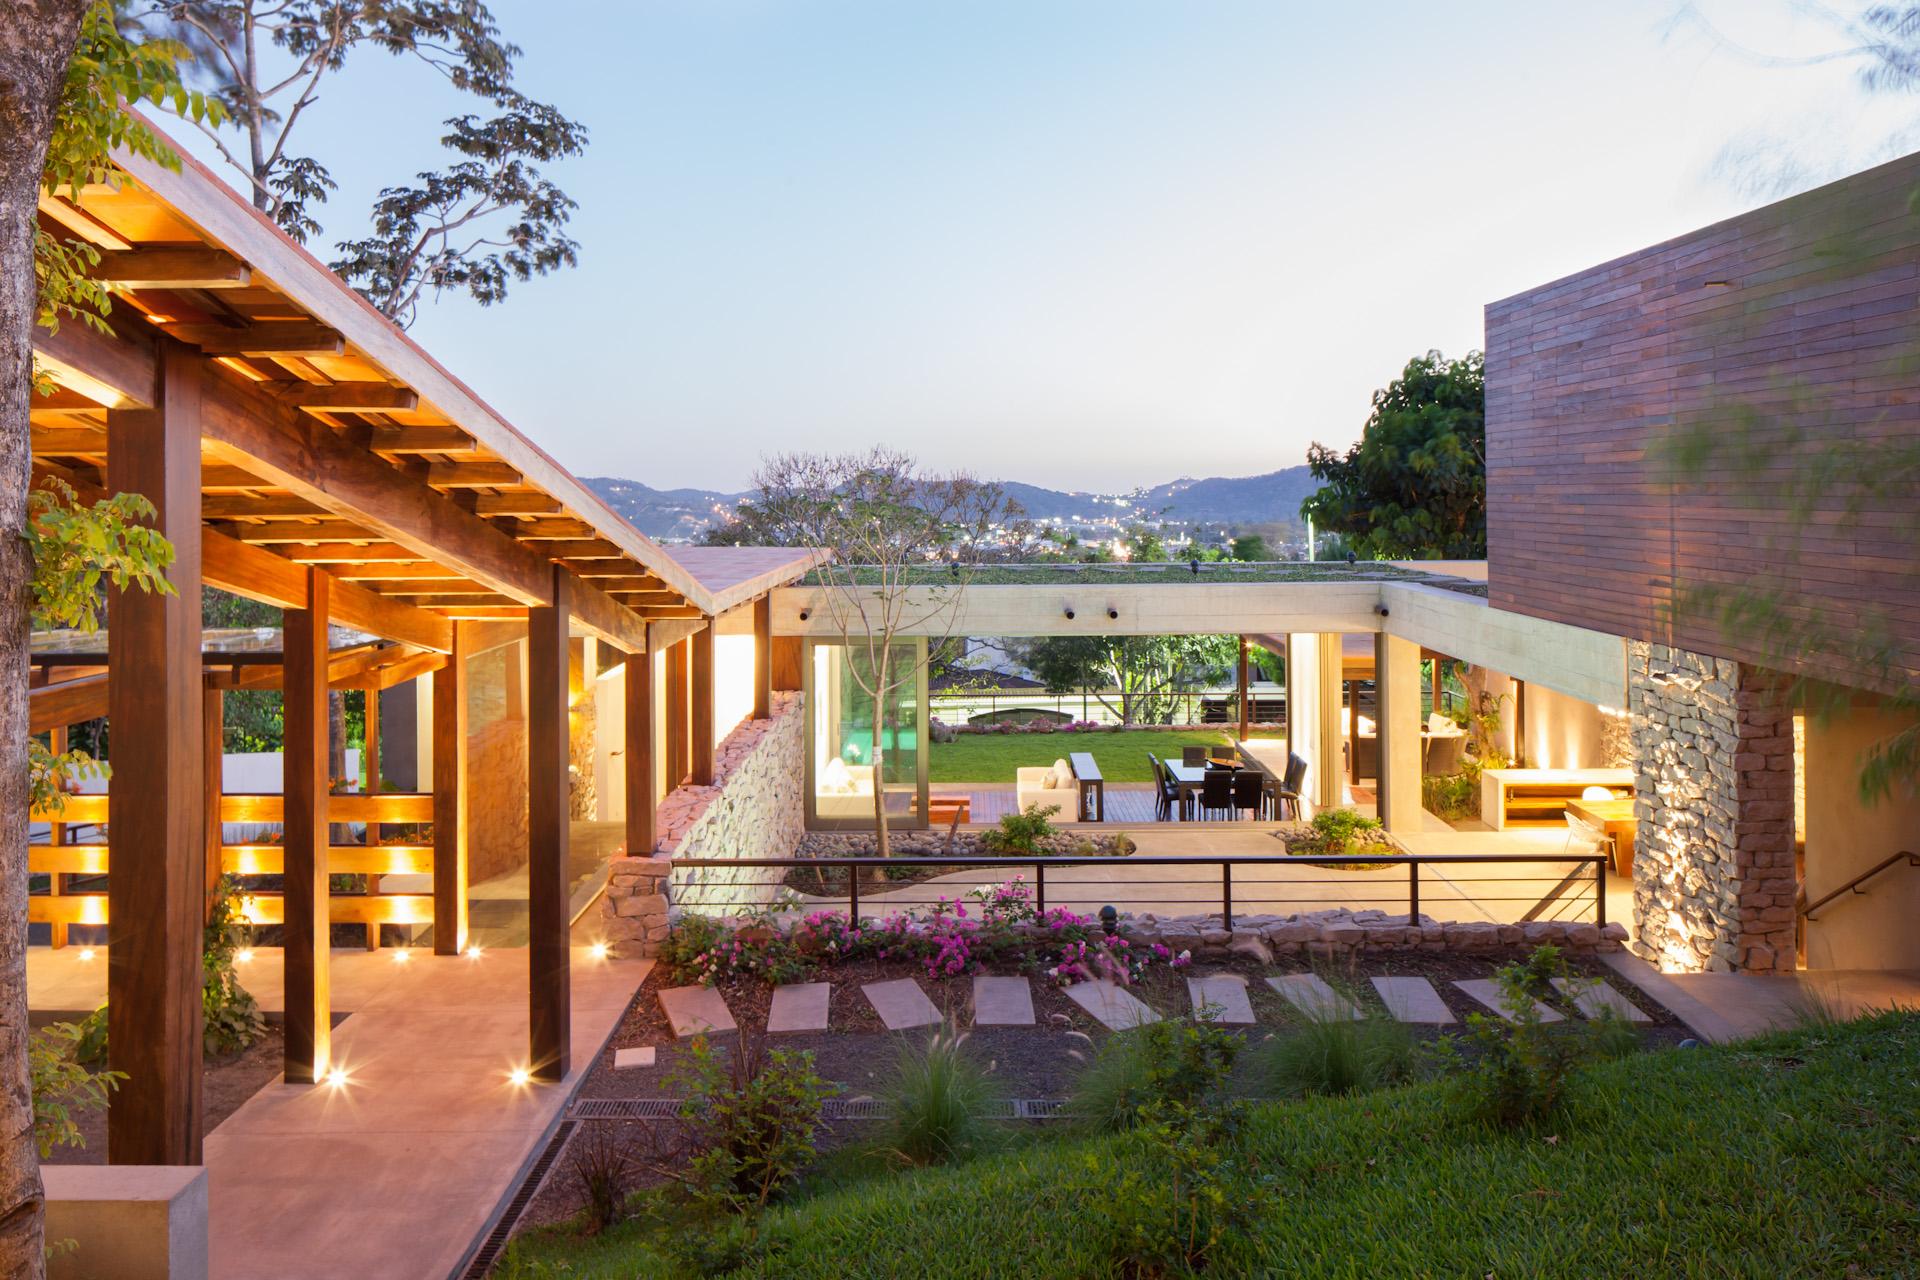 Architecture-Modern-Casa-Jardin-El-Salvador-Jason-Bax-16.JPG